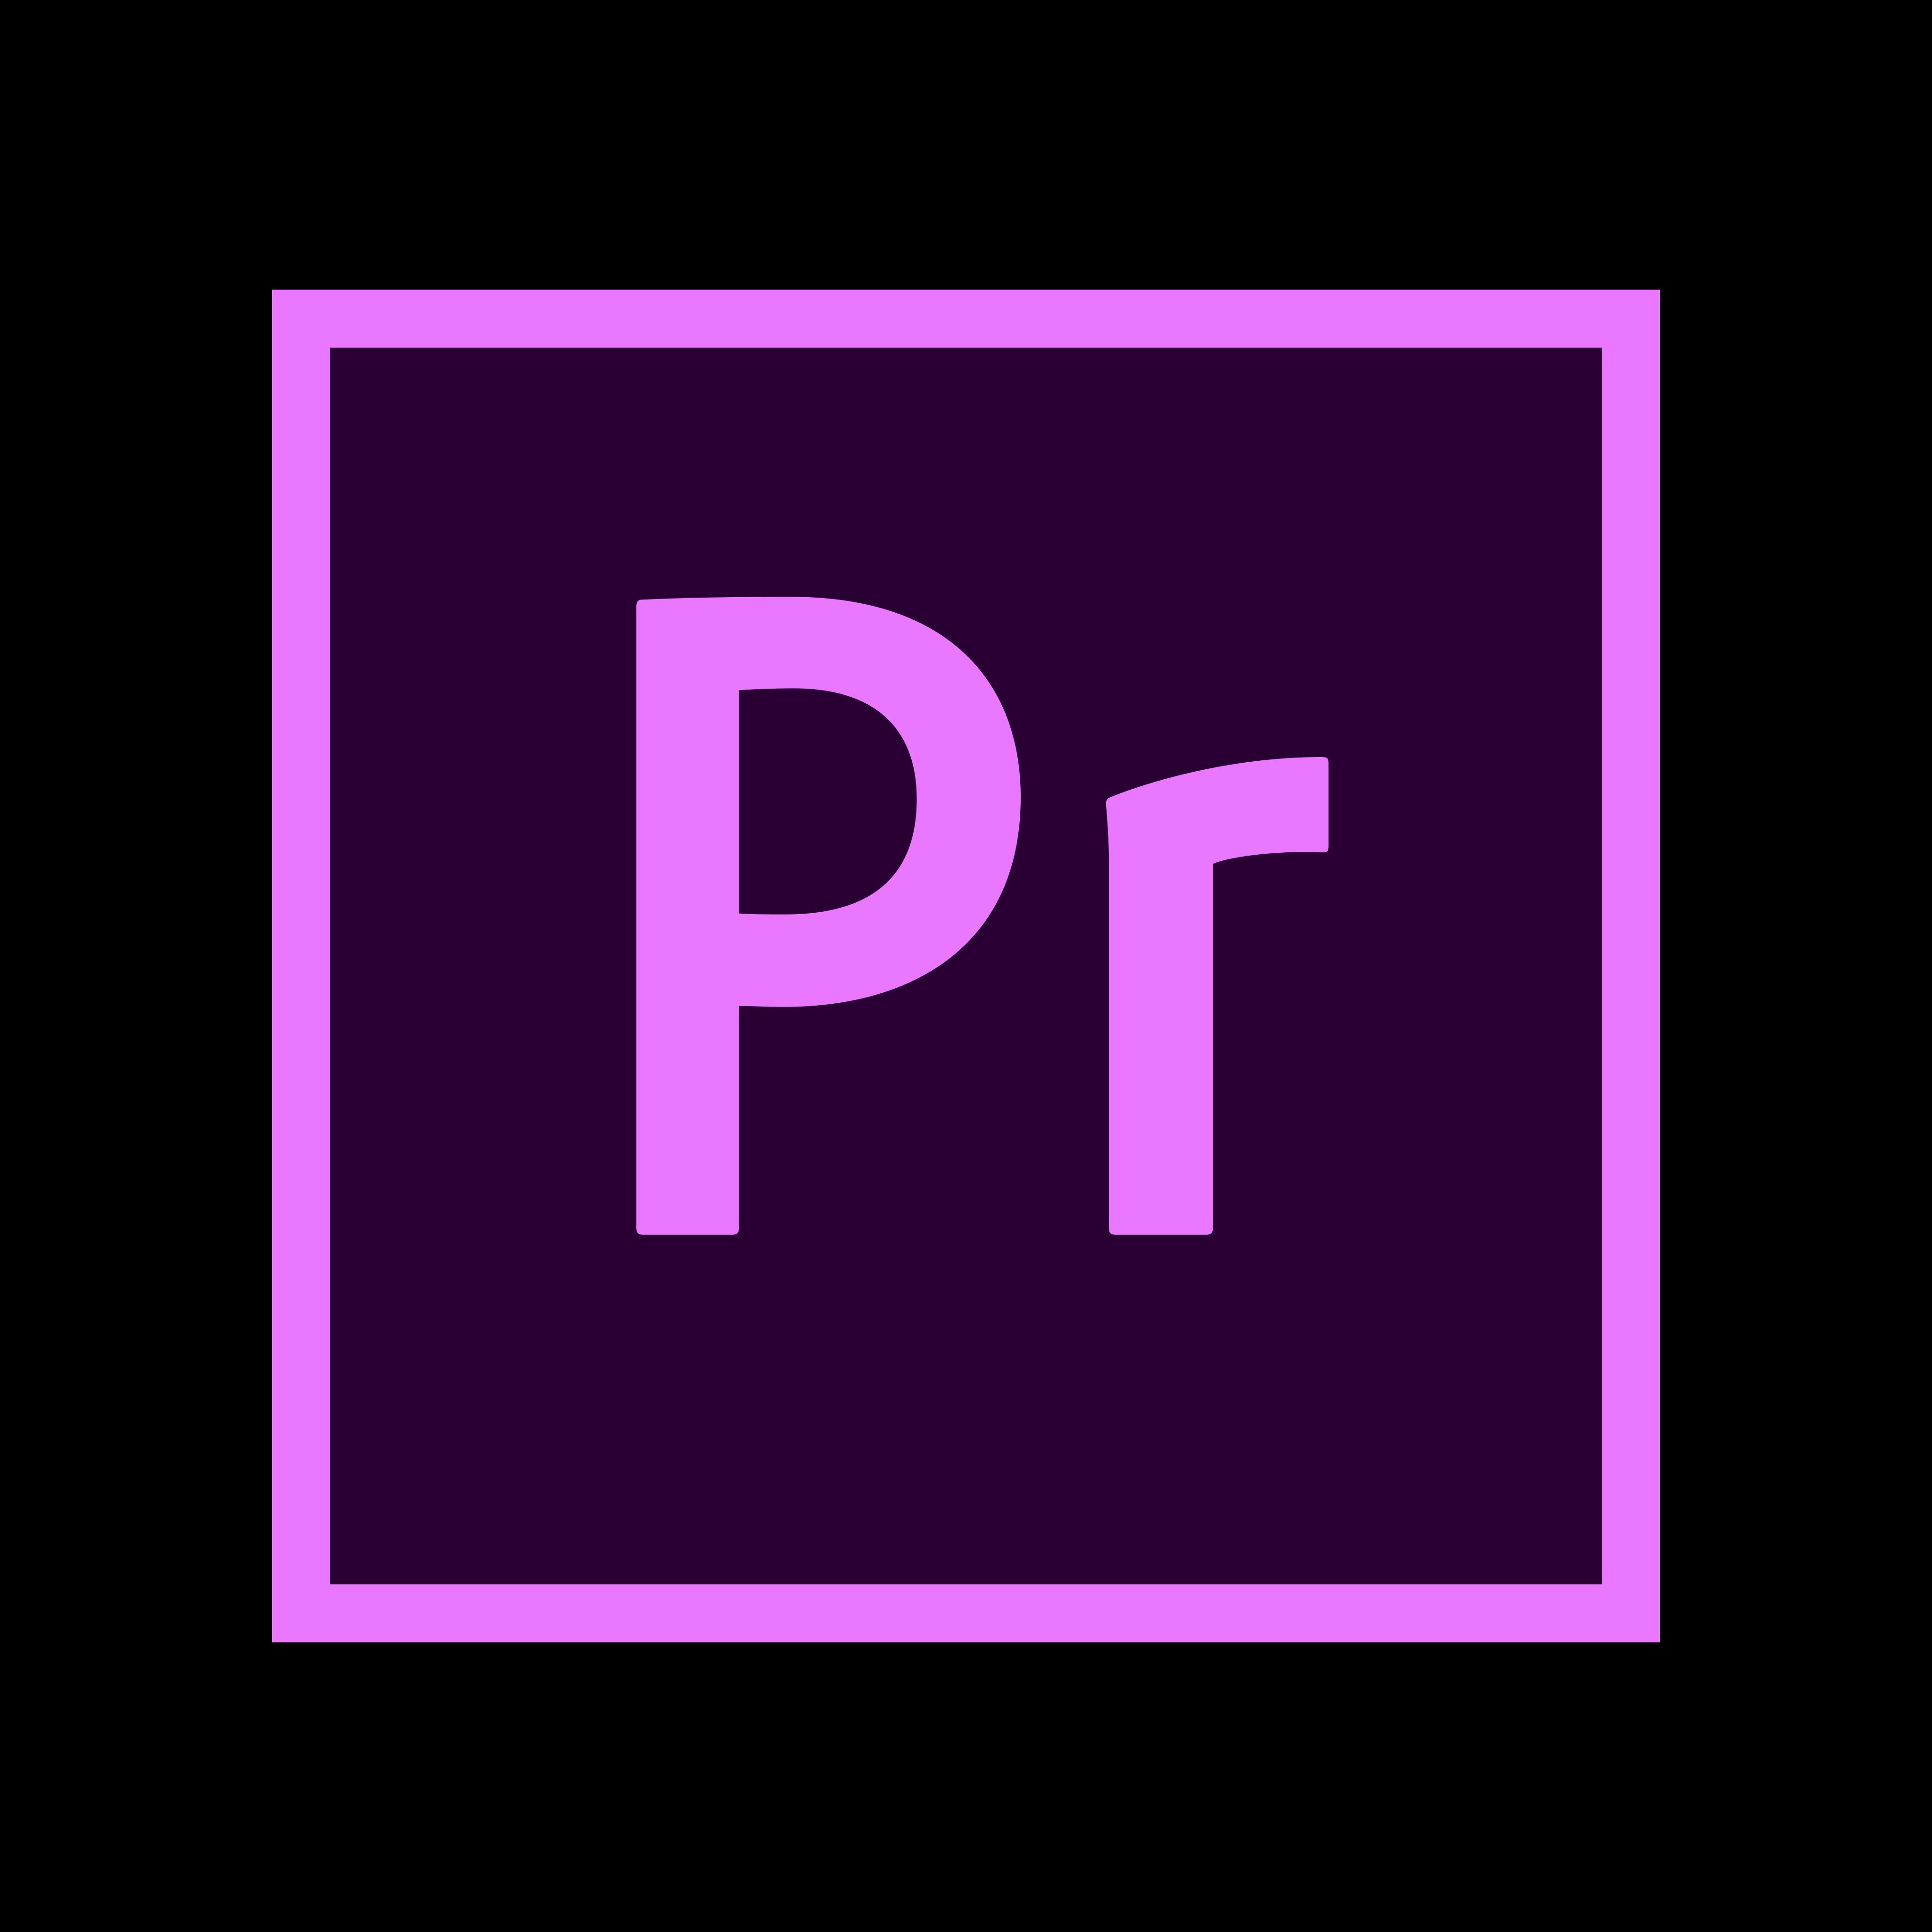 adobe premiere pro logo 0 - Adobe Premiere Pro Logo